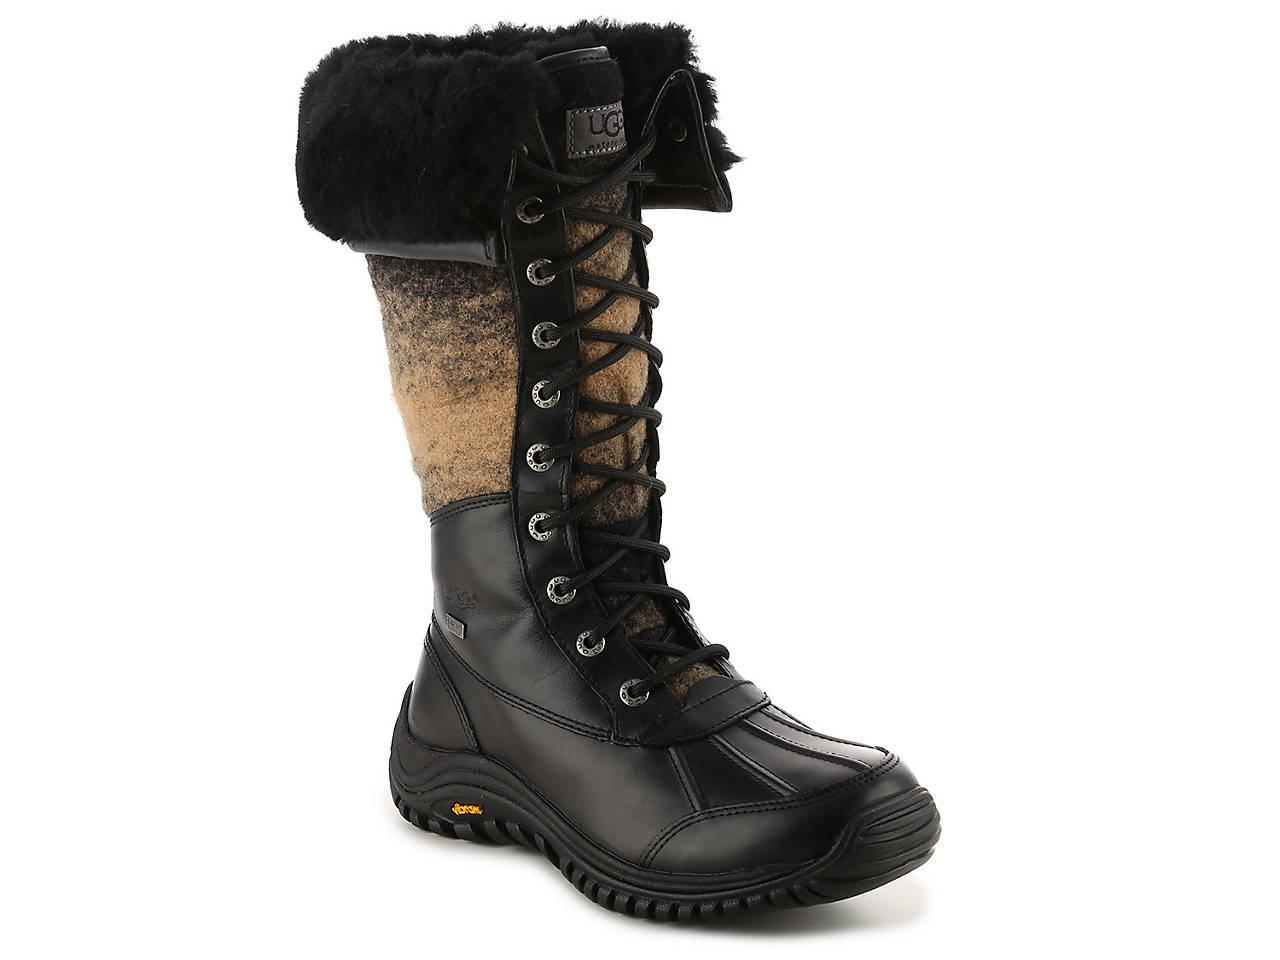 b8b0db4f94e Adirondack Duck Boot